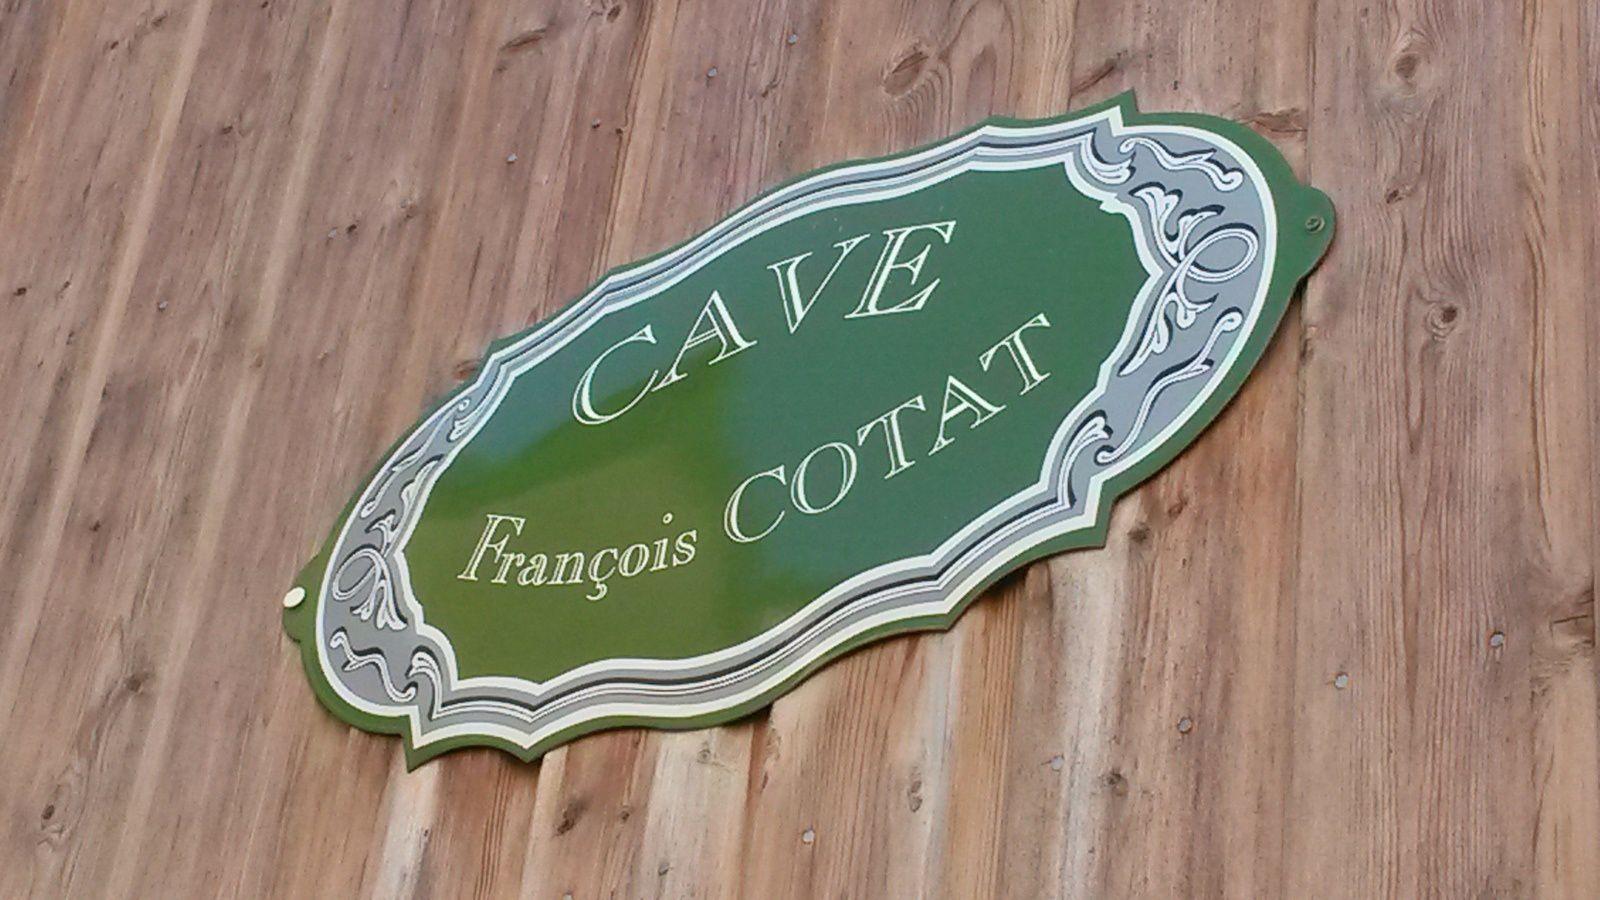 FRANCOIS COTAT, SANCERRE